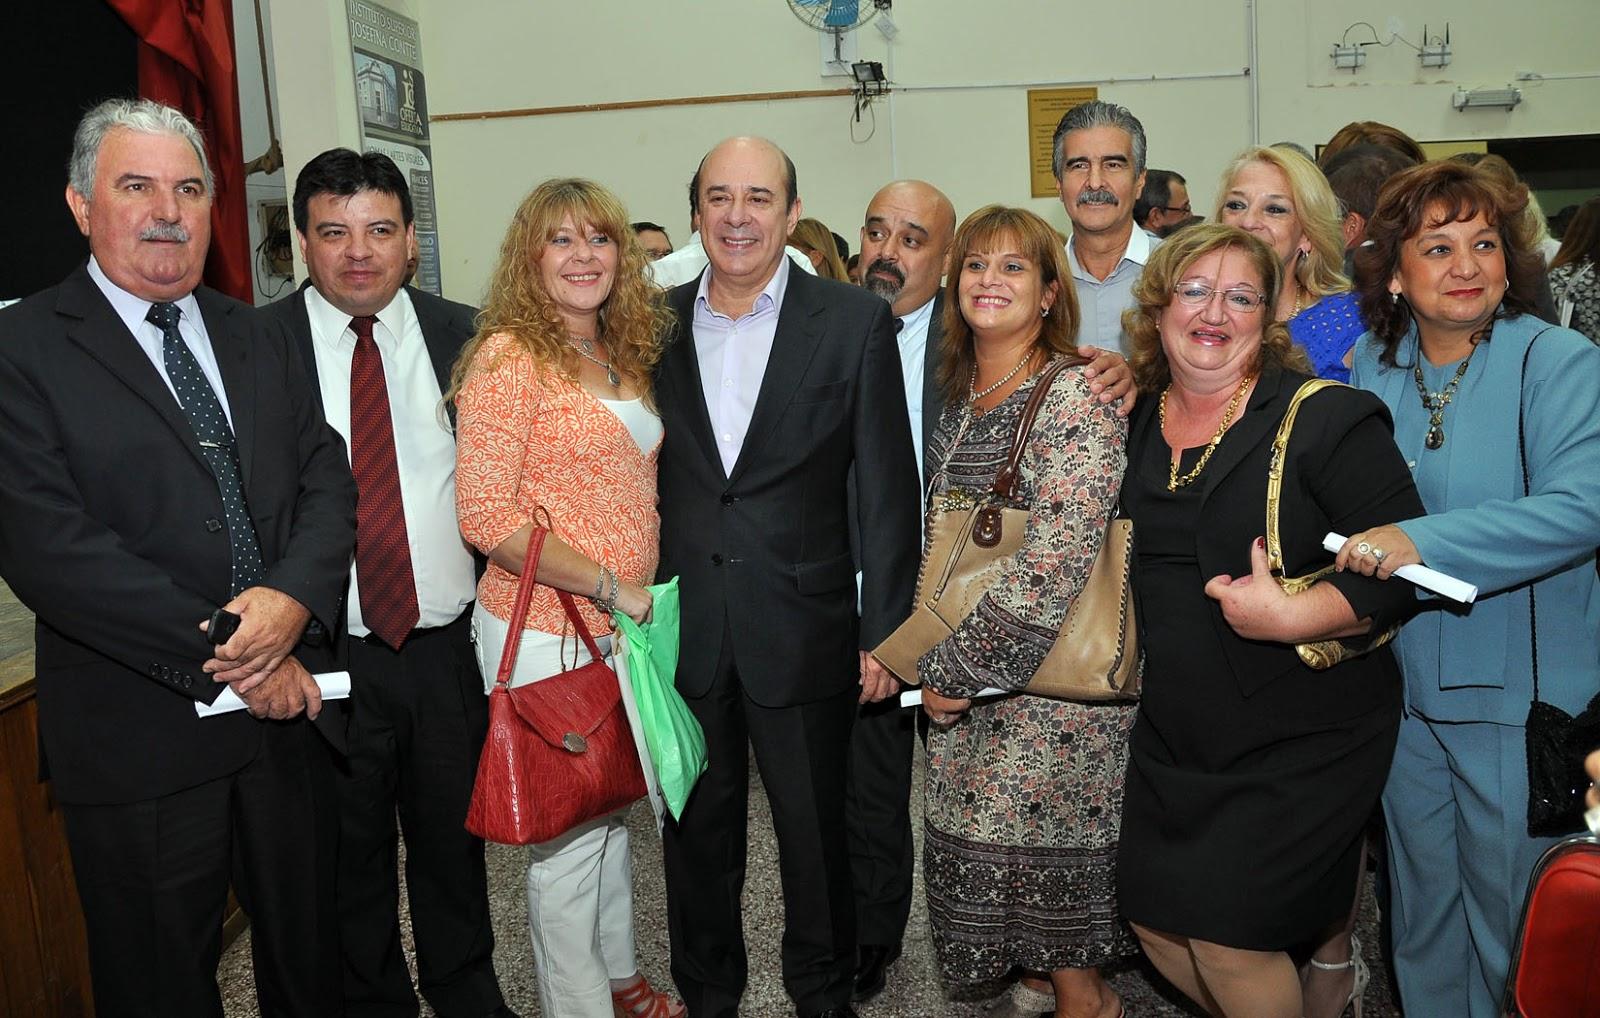 B ACTA DE REUNIÓN DE LA JUNTA DIRECTIVA DE